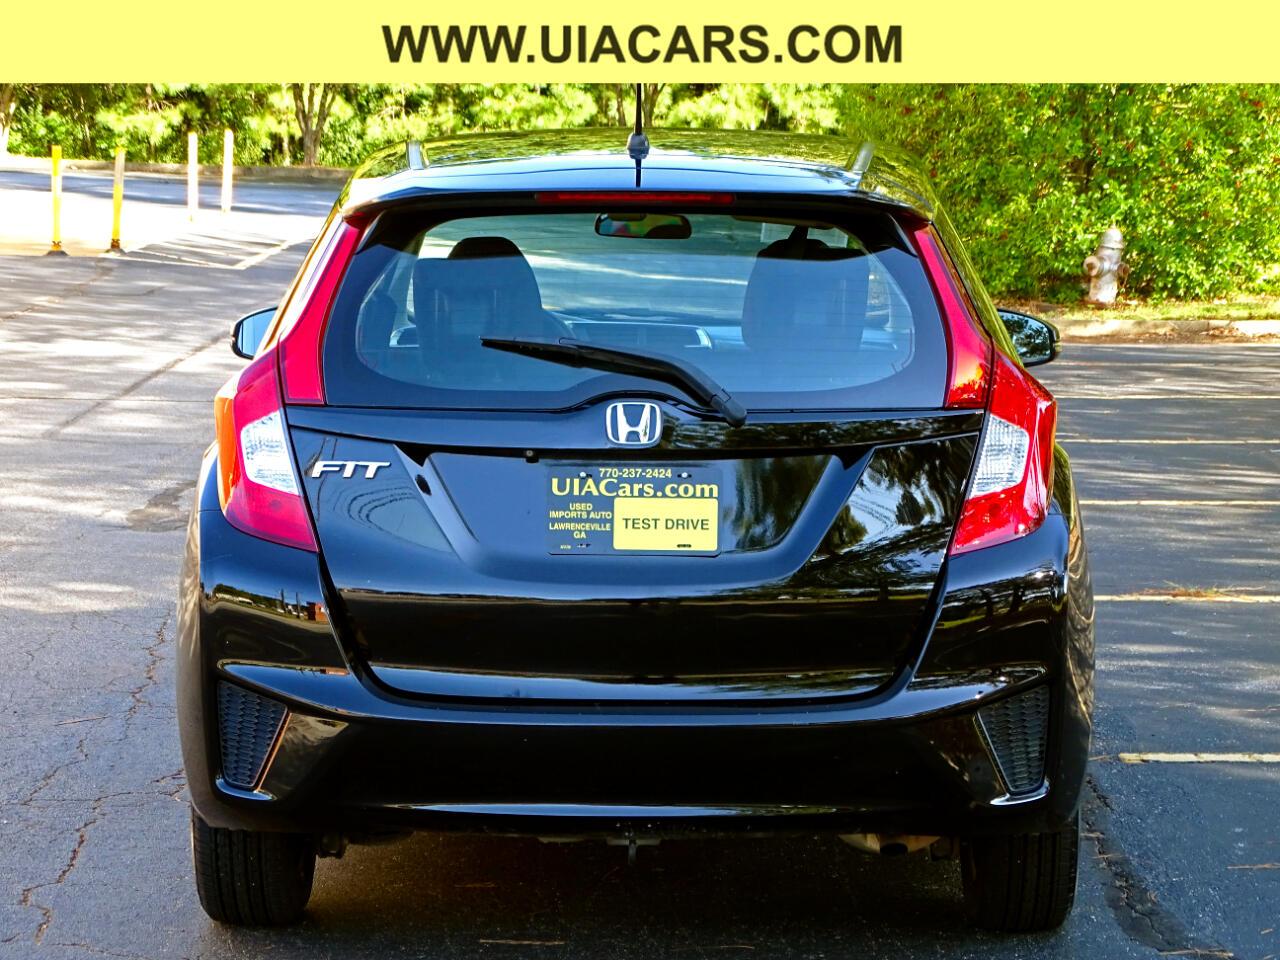 2015 Honda Fit 5dr HB CVT LX